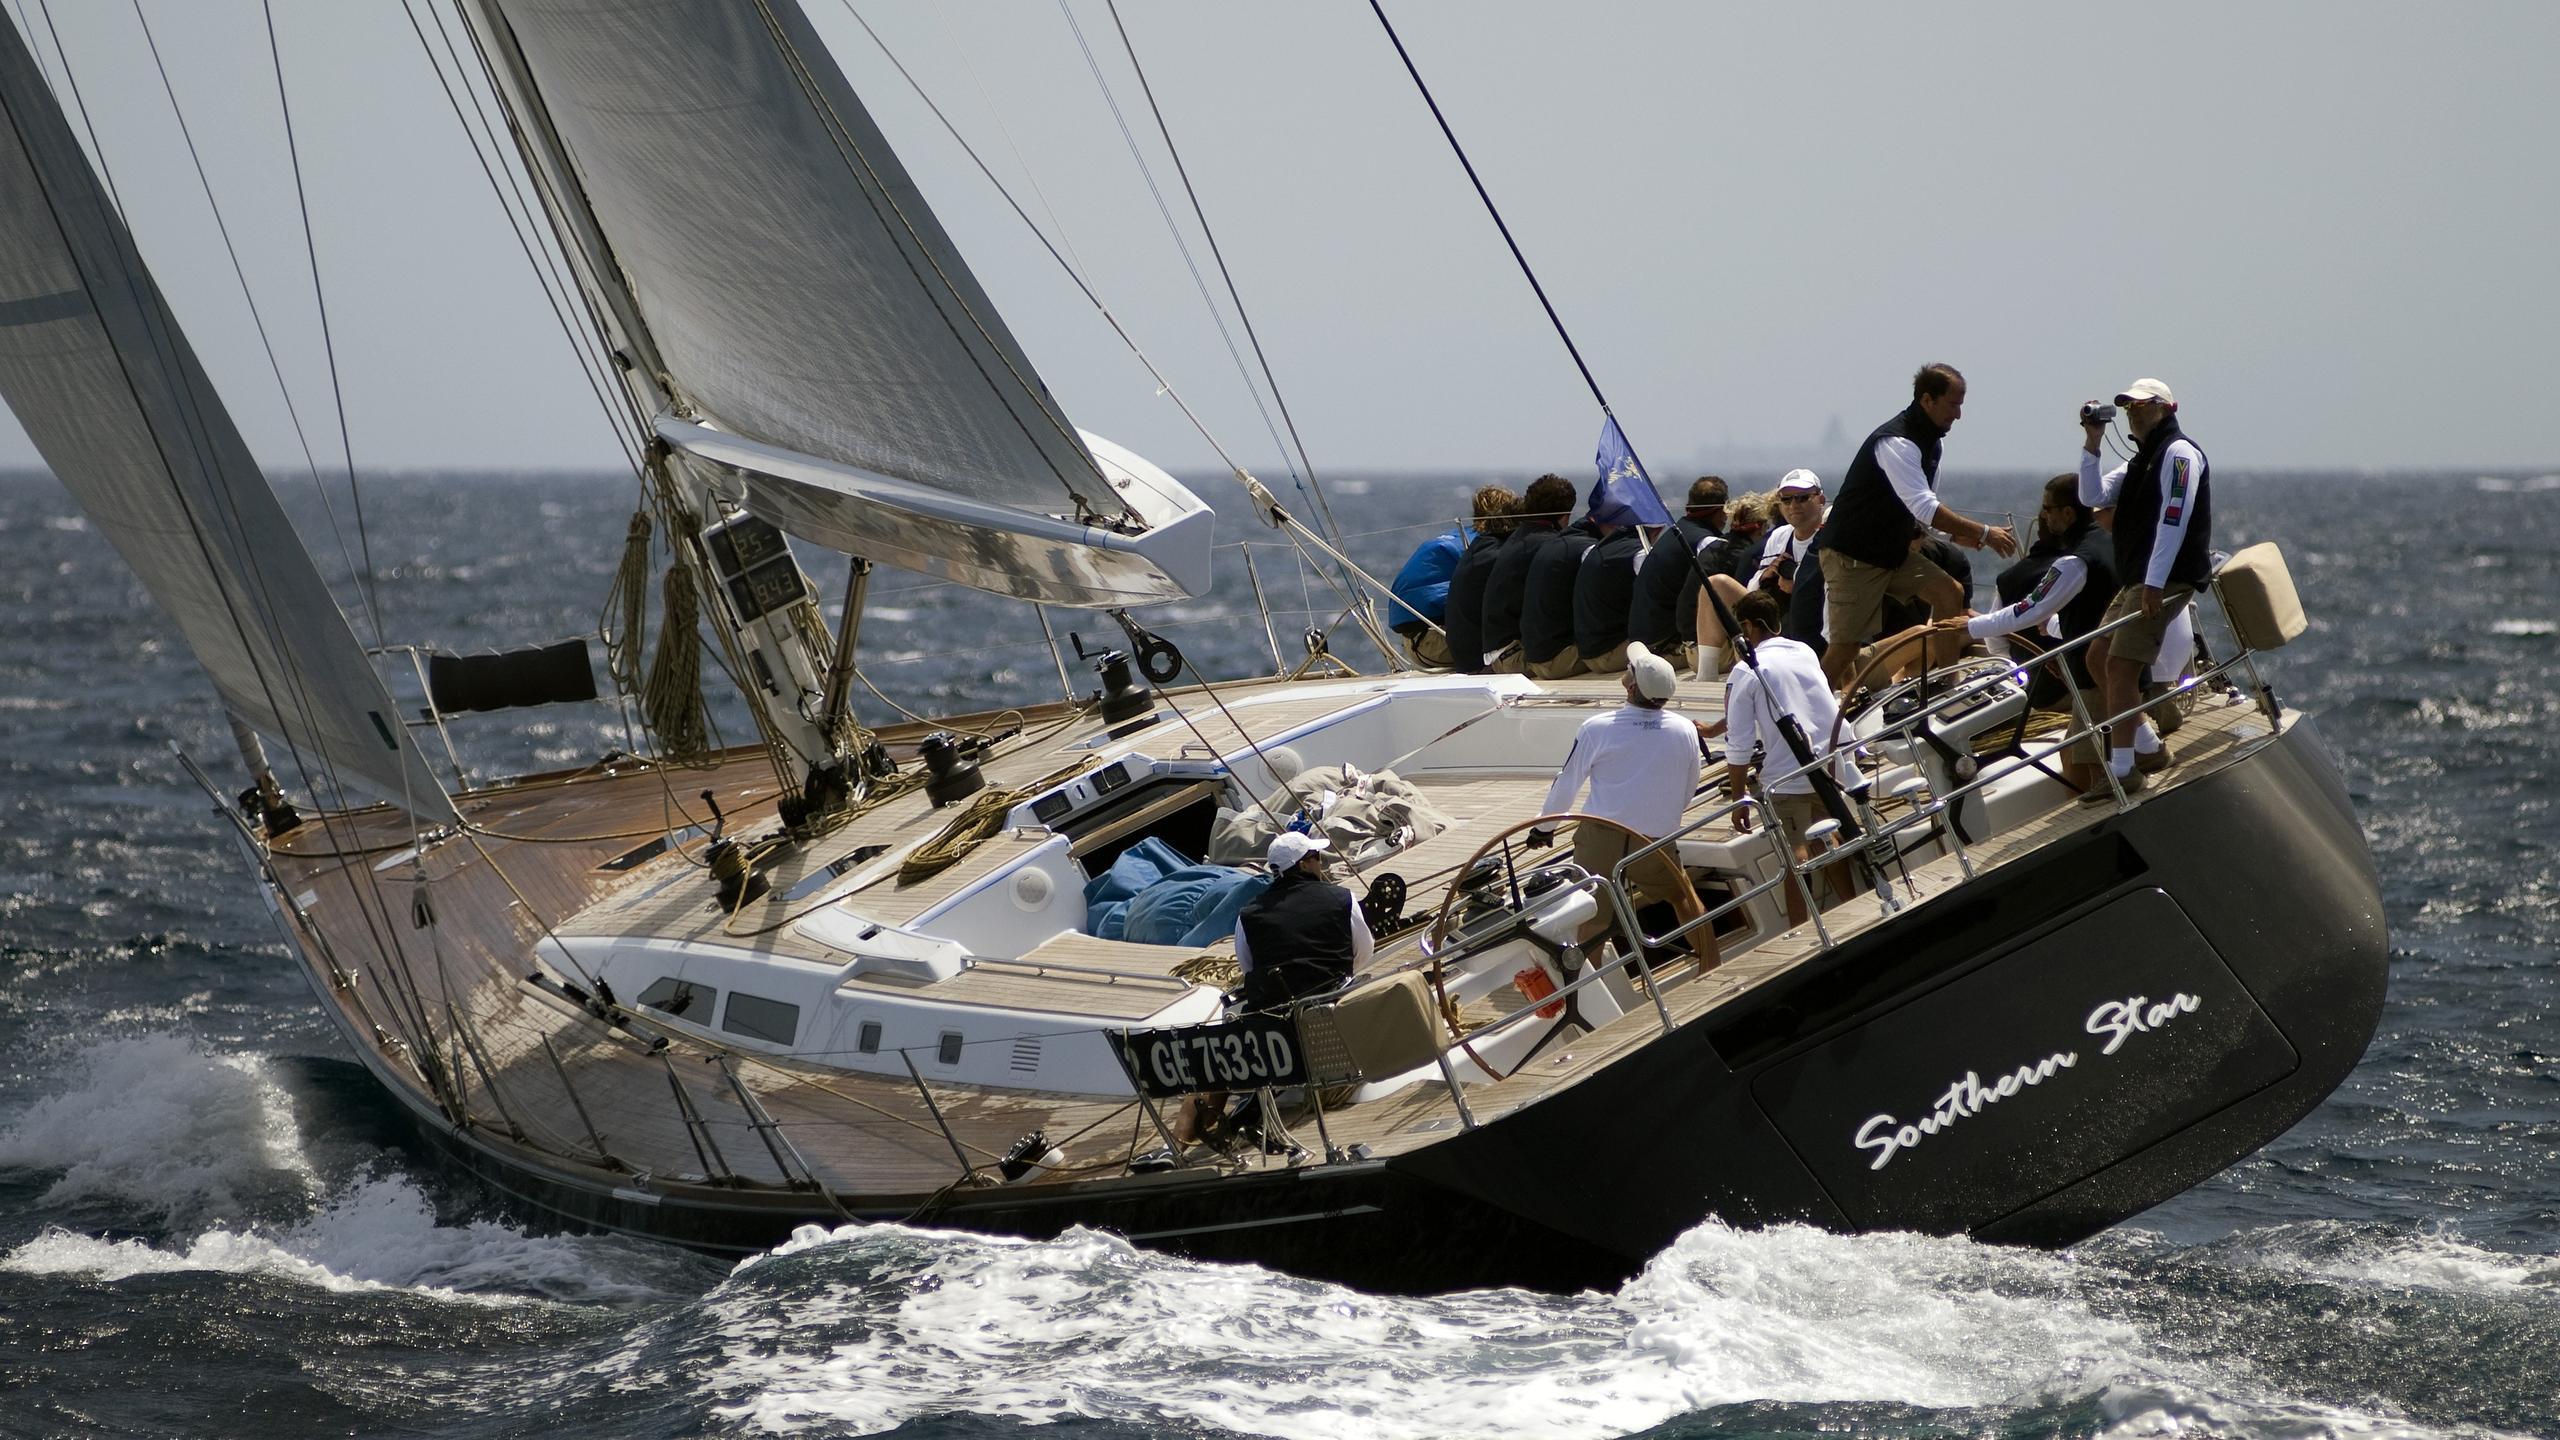 Southern Star sailing yacht running aft